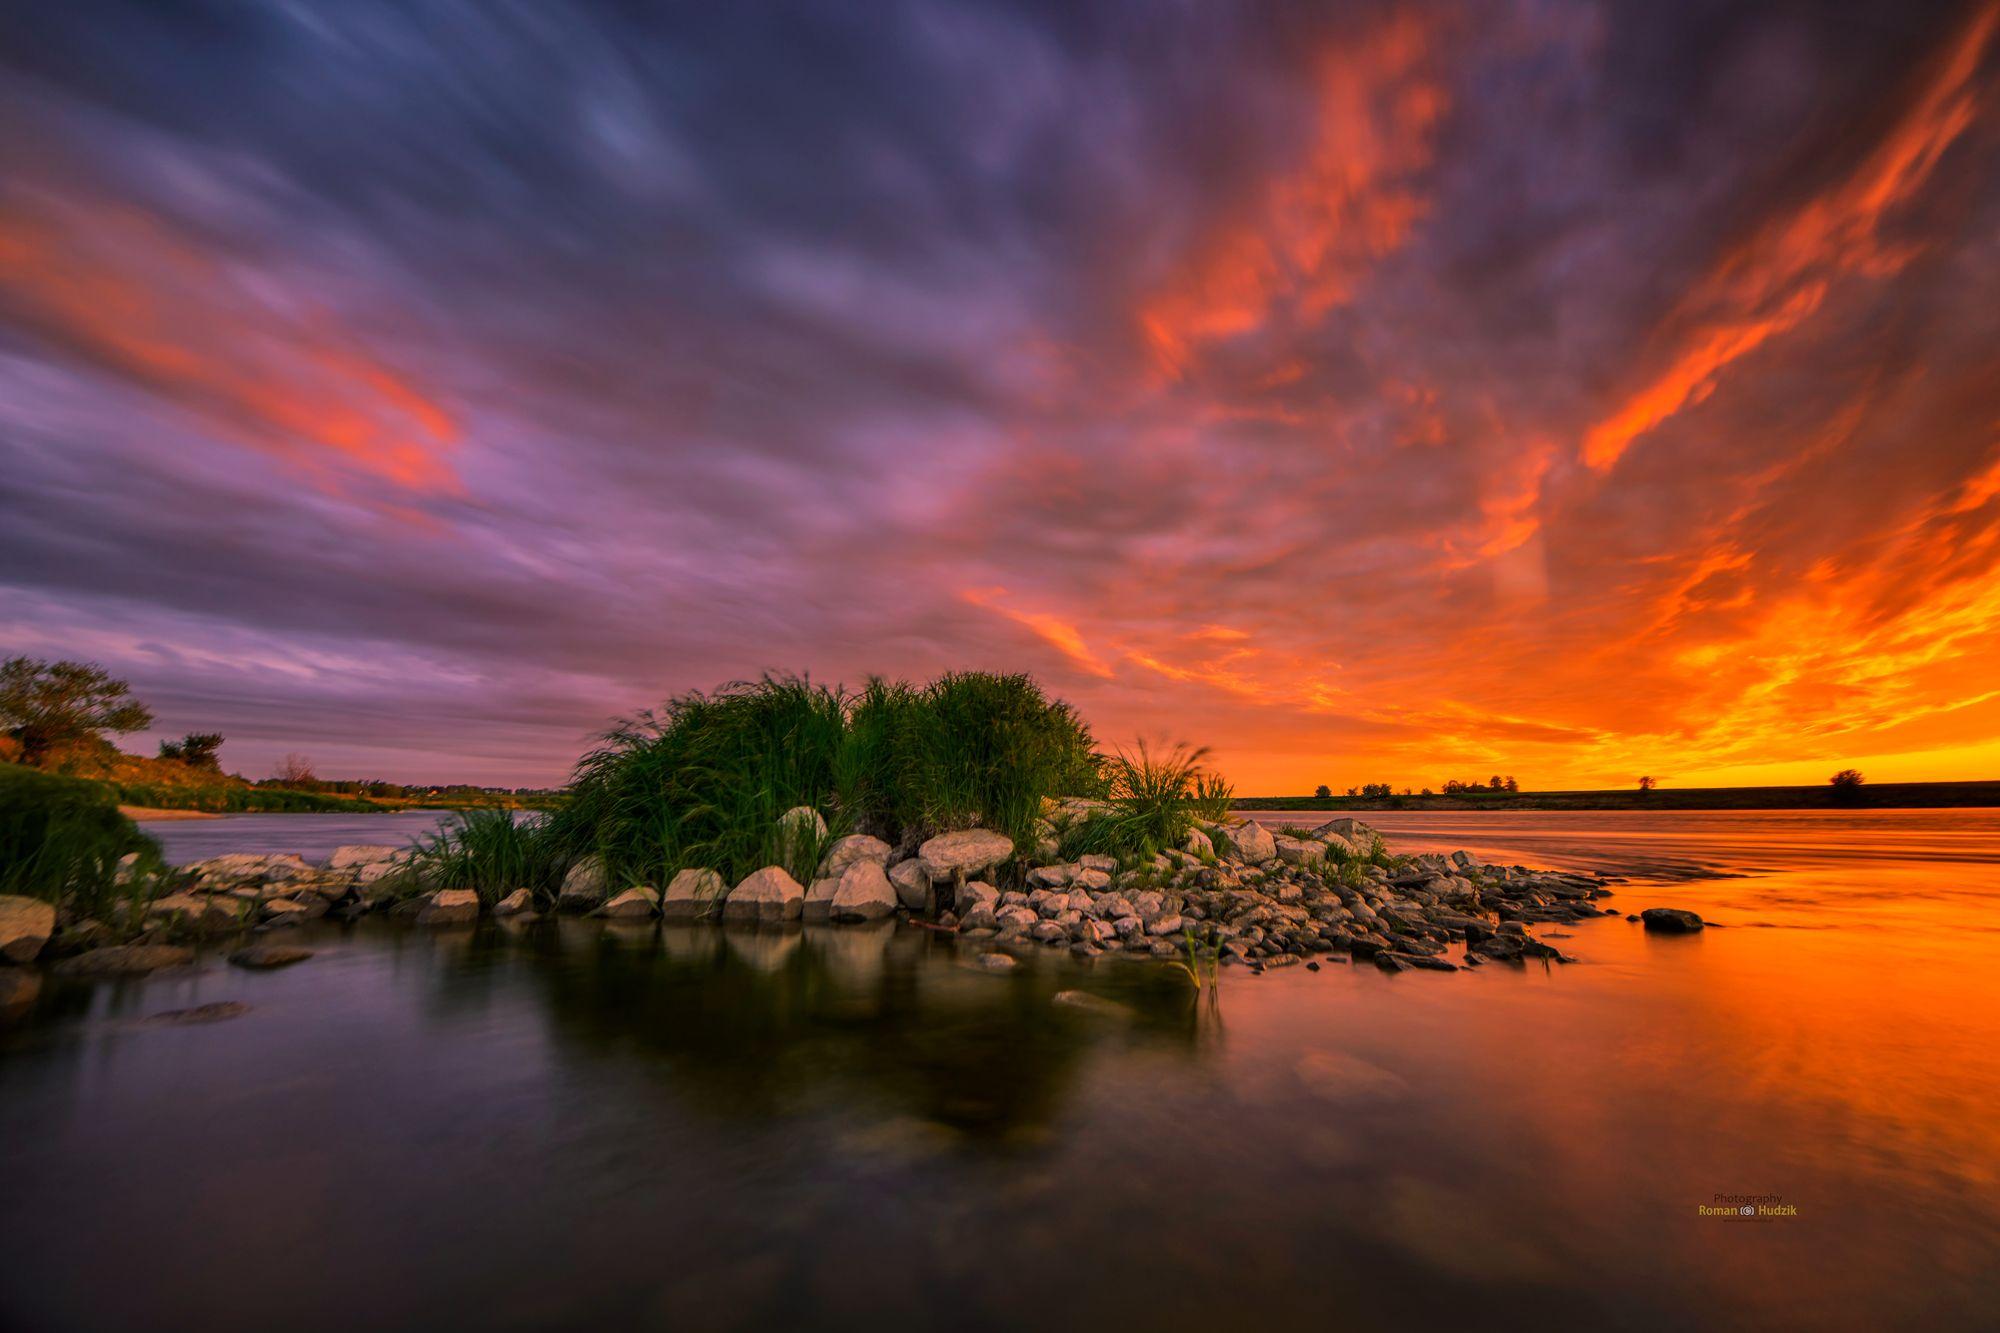 river, landscape, clouds, sunrise, water, sunrise colors, island, stones., Hudzik Roman